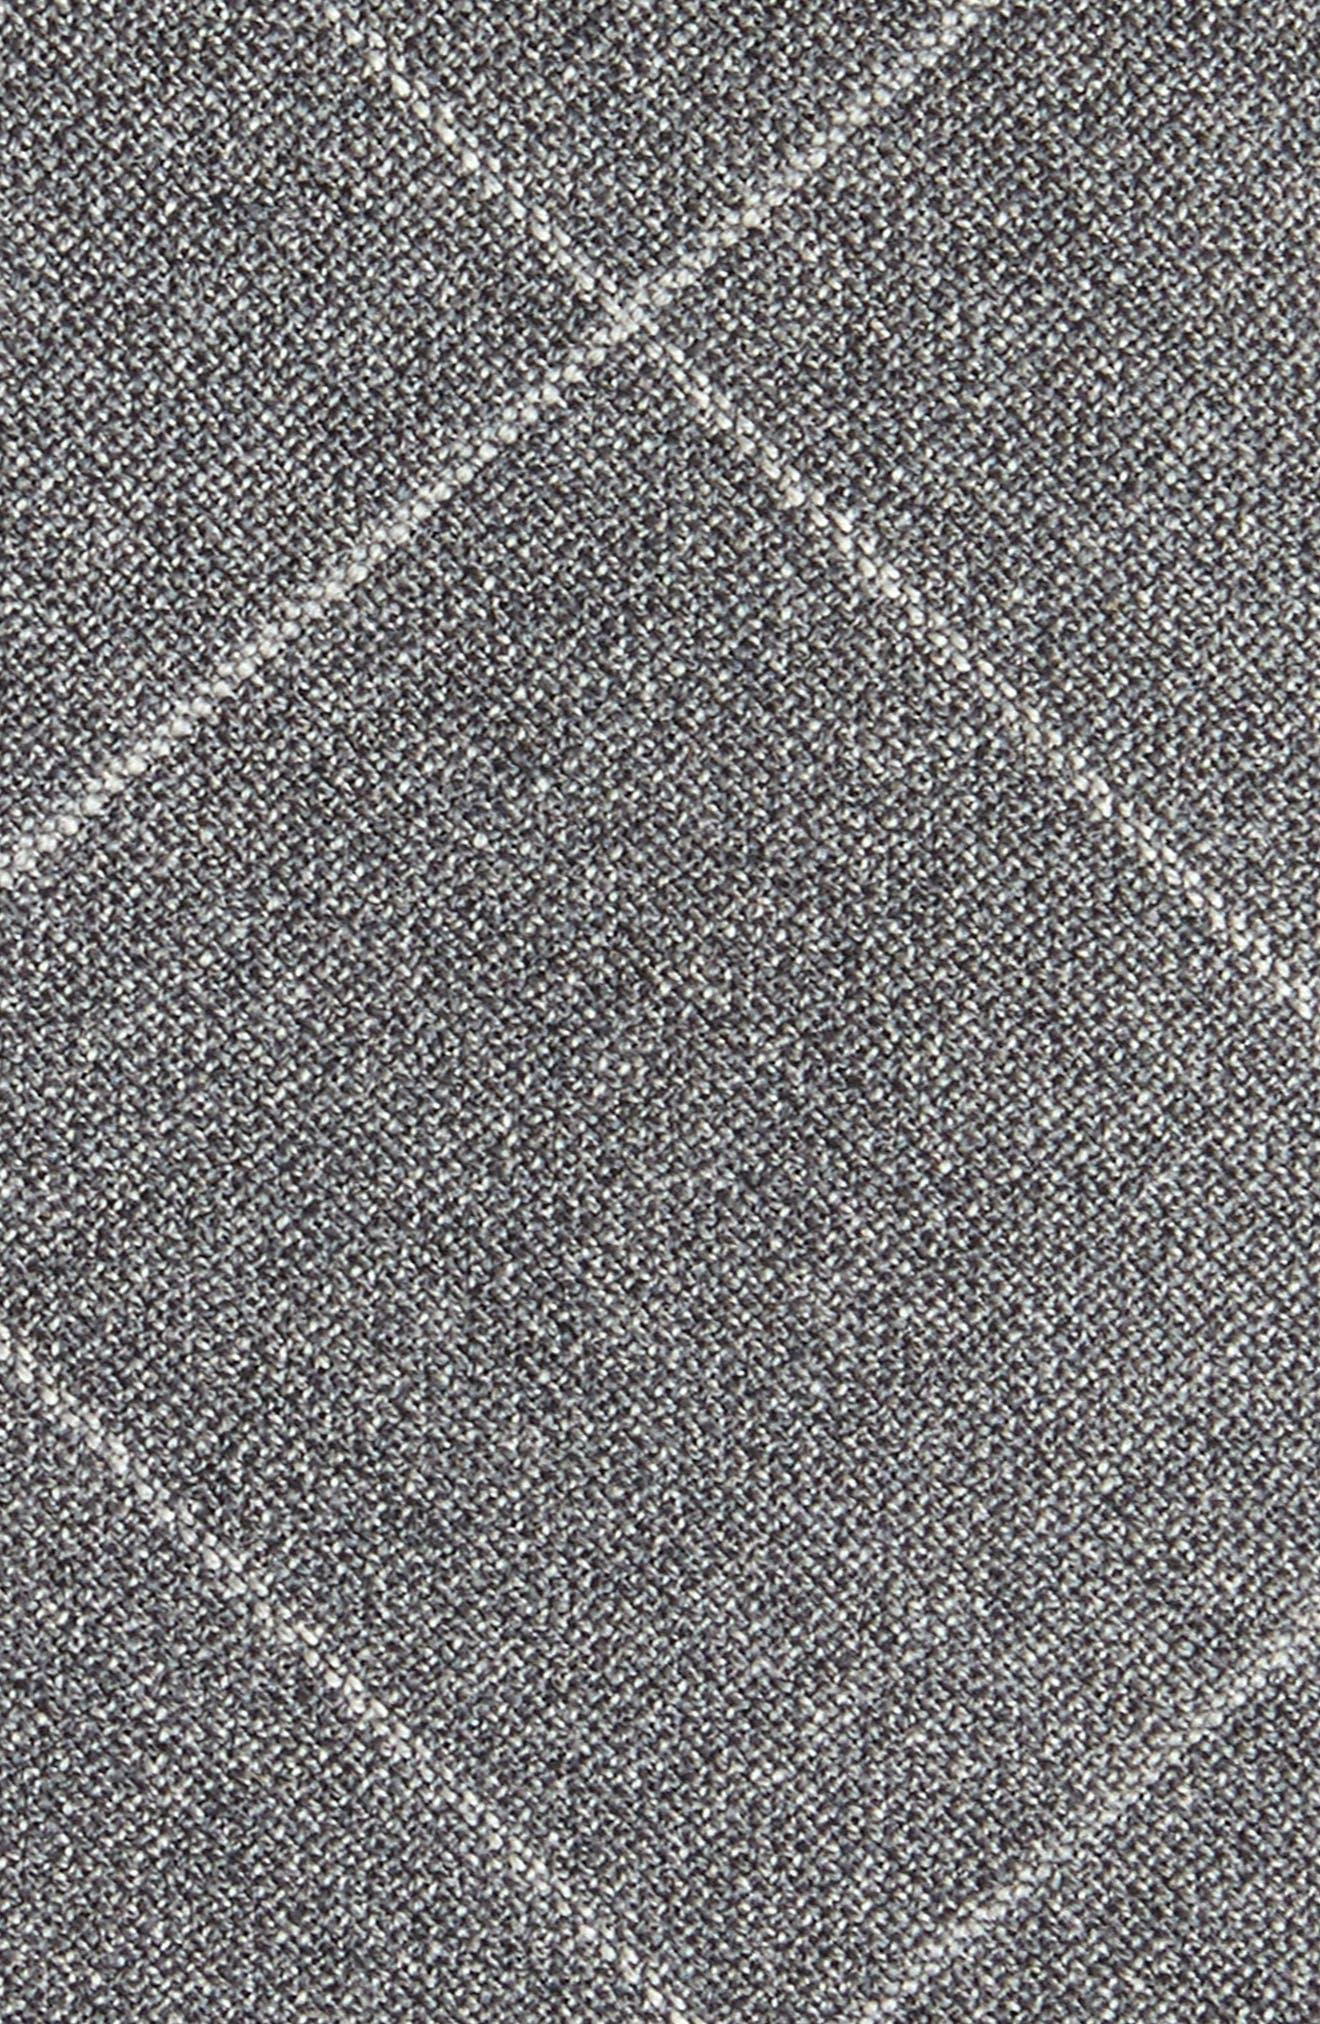 Tattersall Wool Skinny Tie,                             Alternate thumbnail 2, color,                             GREY